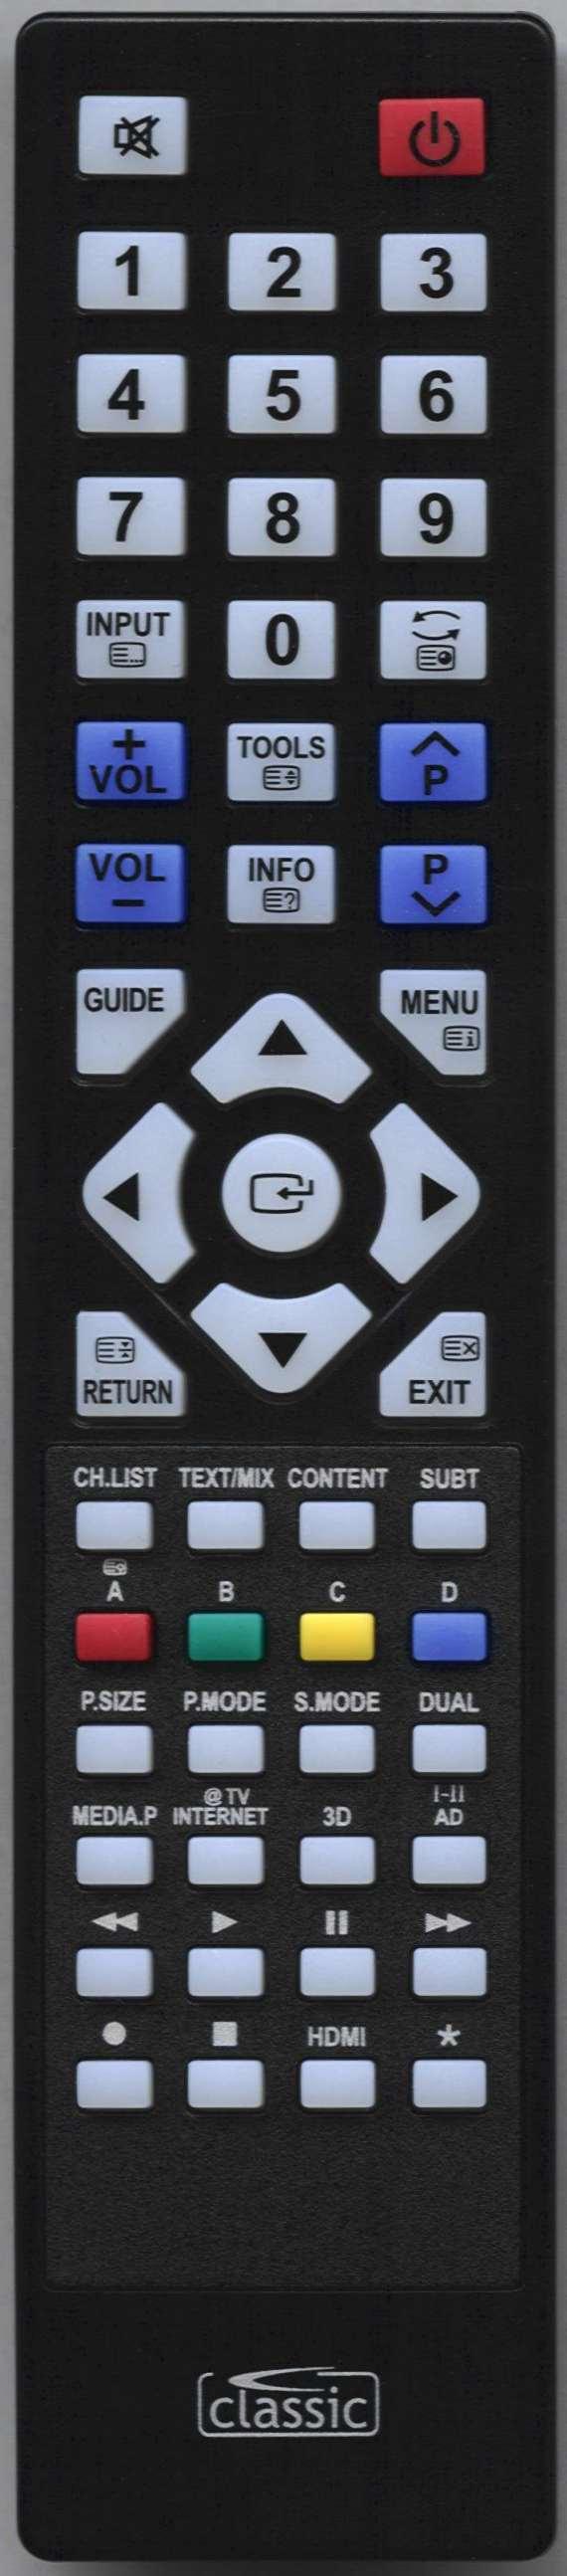 SAMSUNG PS42C450B1WXXU Remote Control Alternative